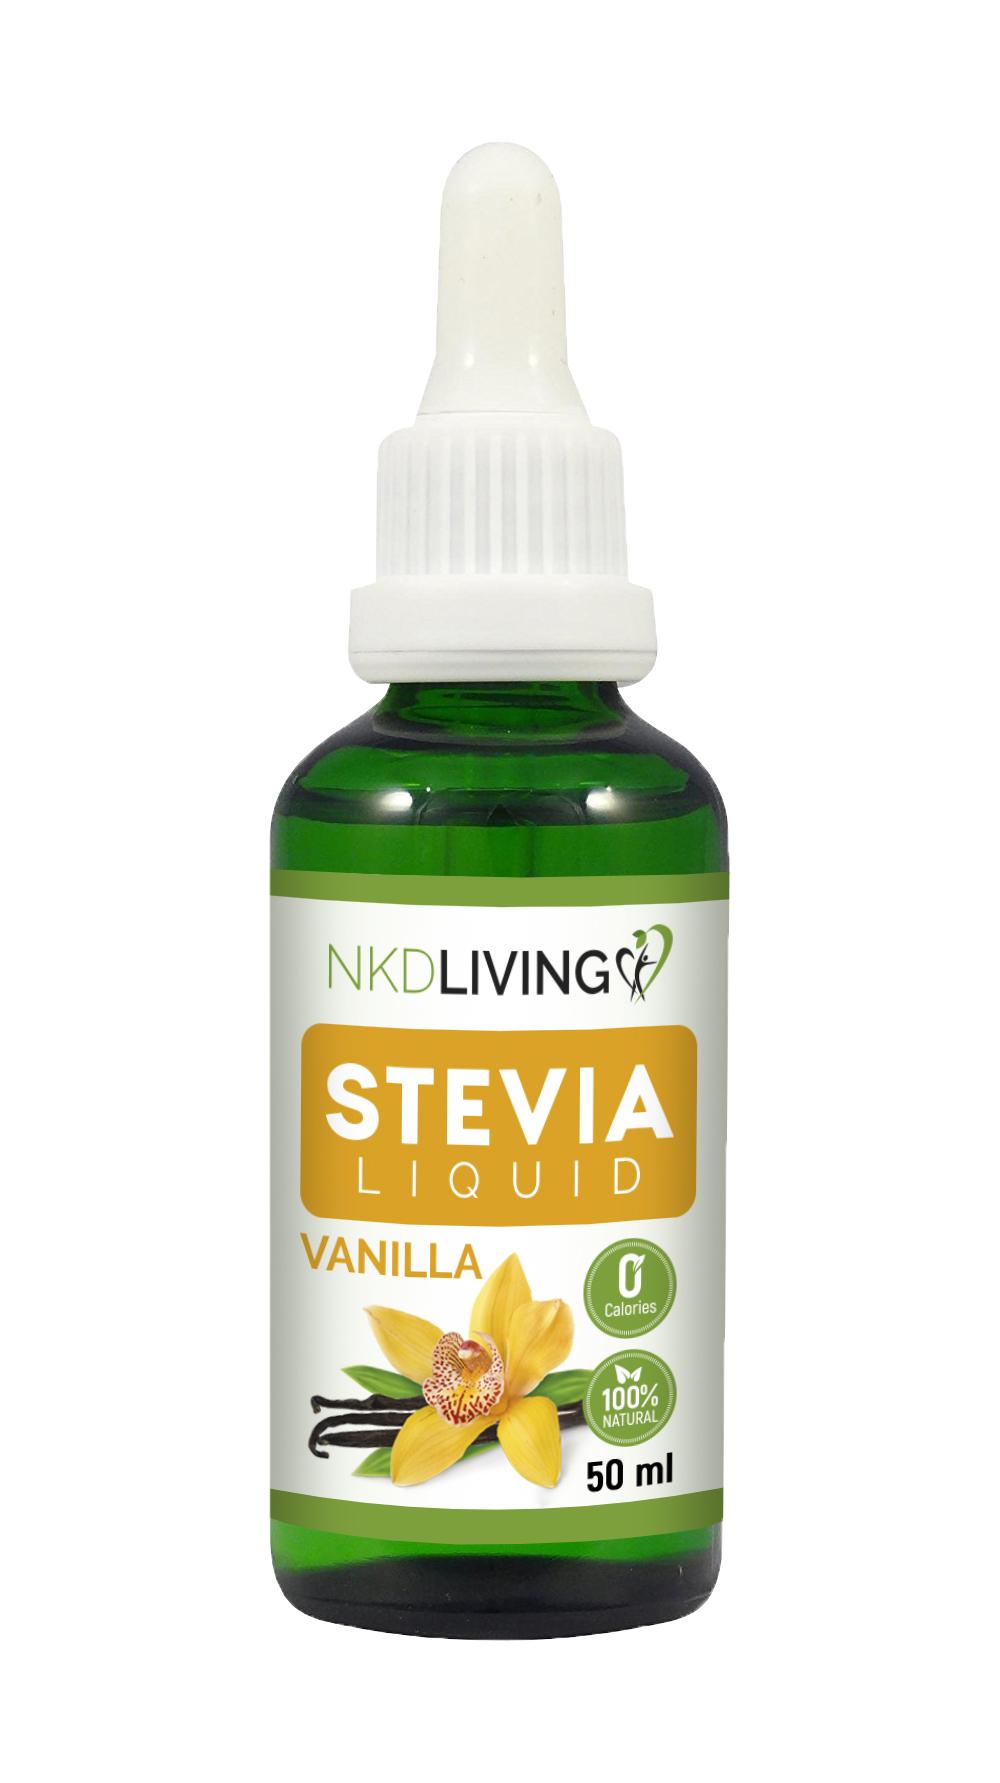 Stevia Liquid Vanilla 50ml